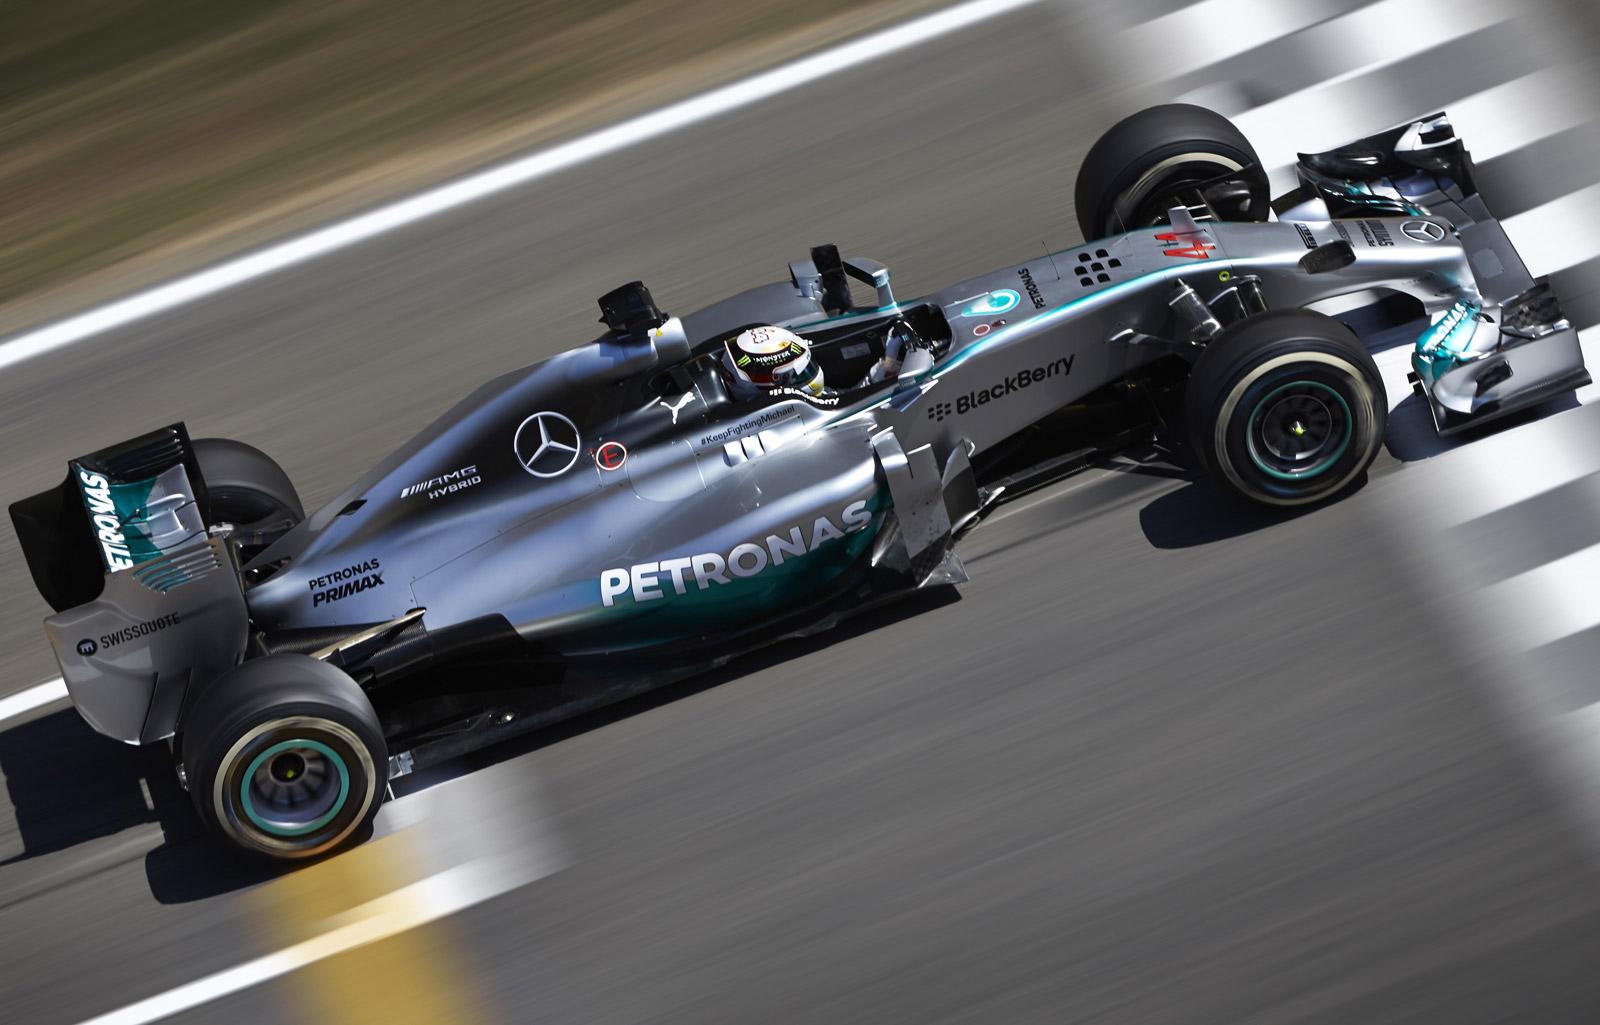 Mercedes AMG Lewis Hamilton 2014 F1 Spain GP